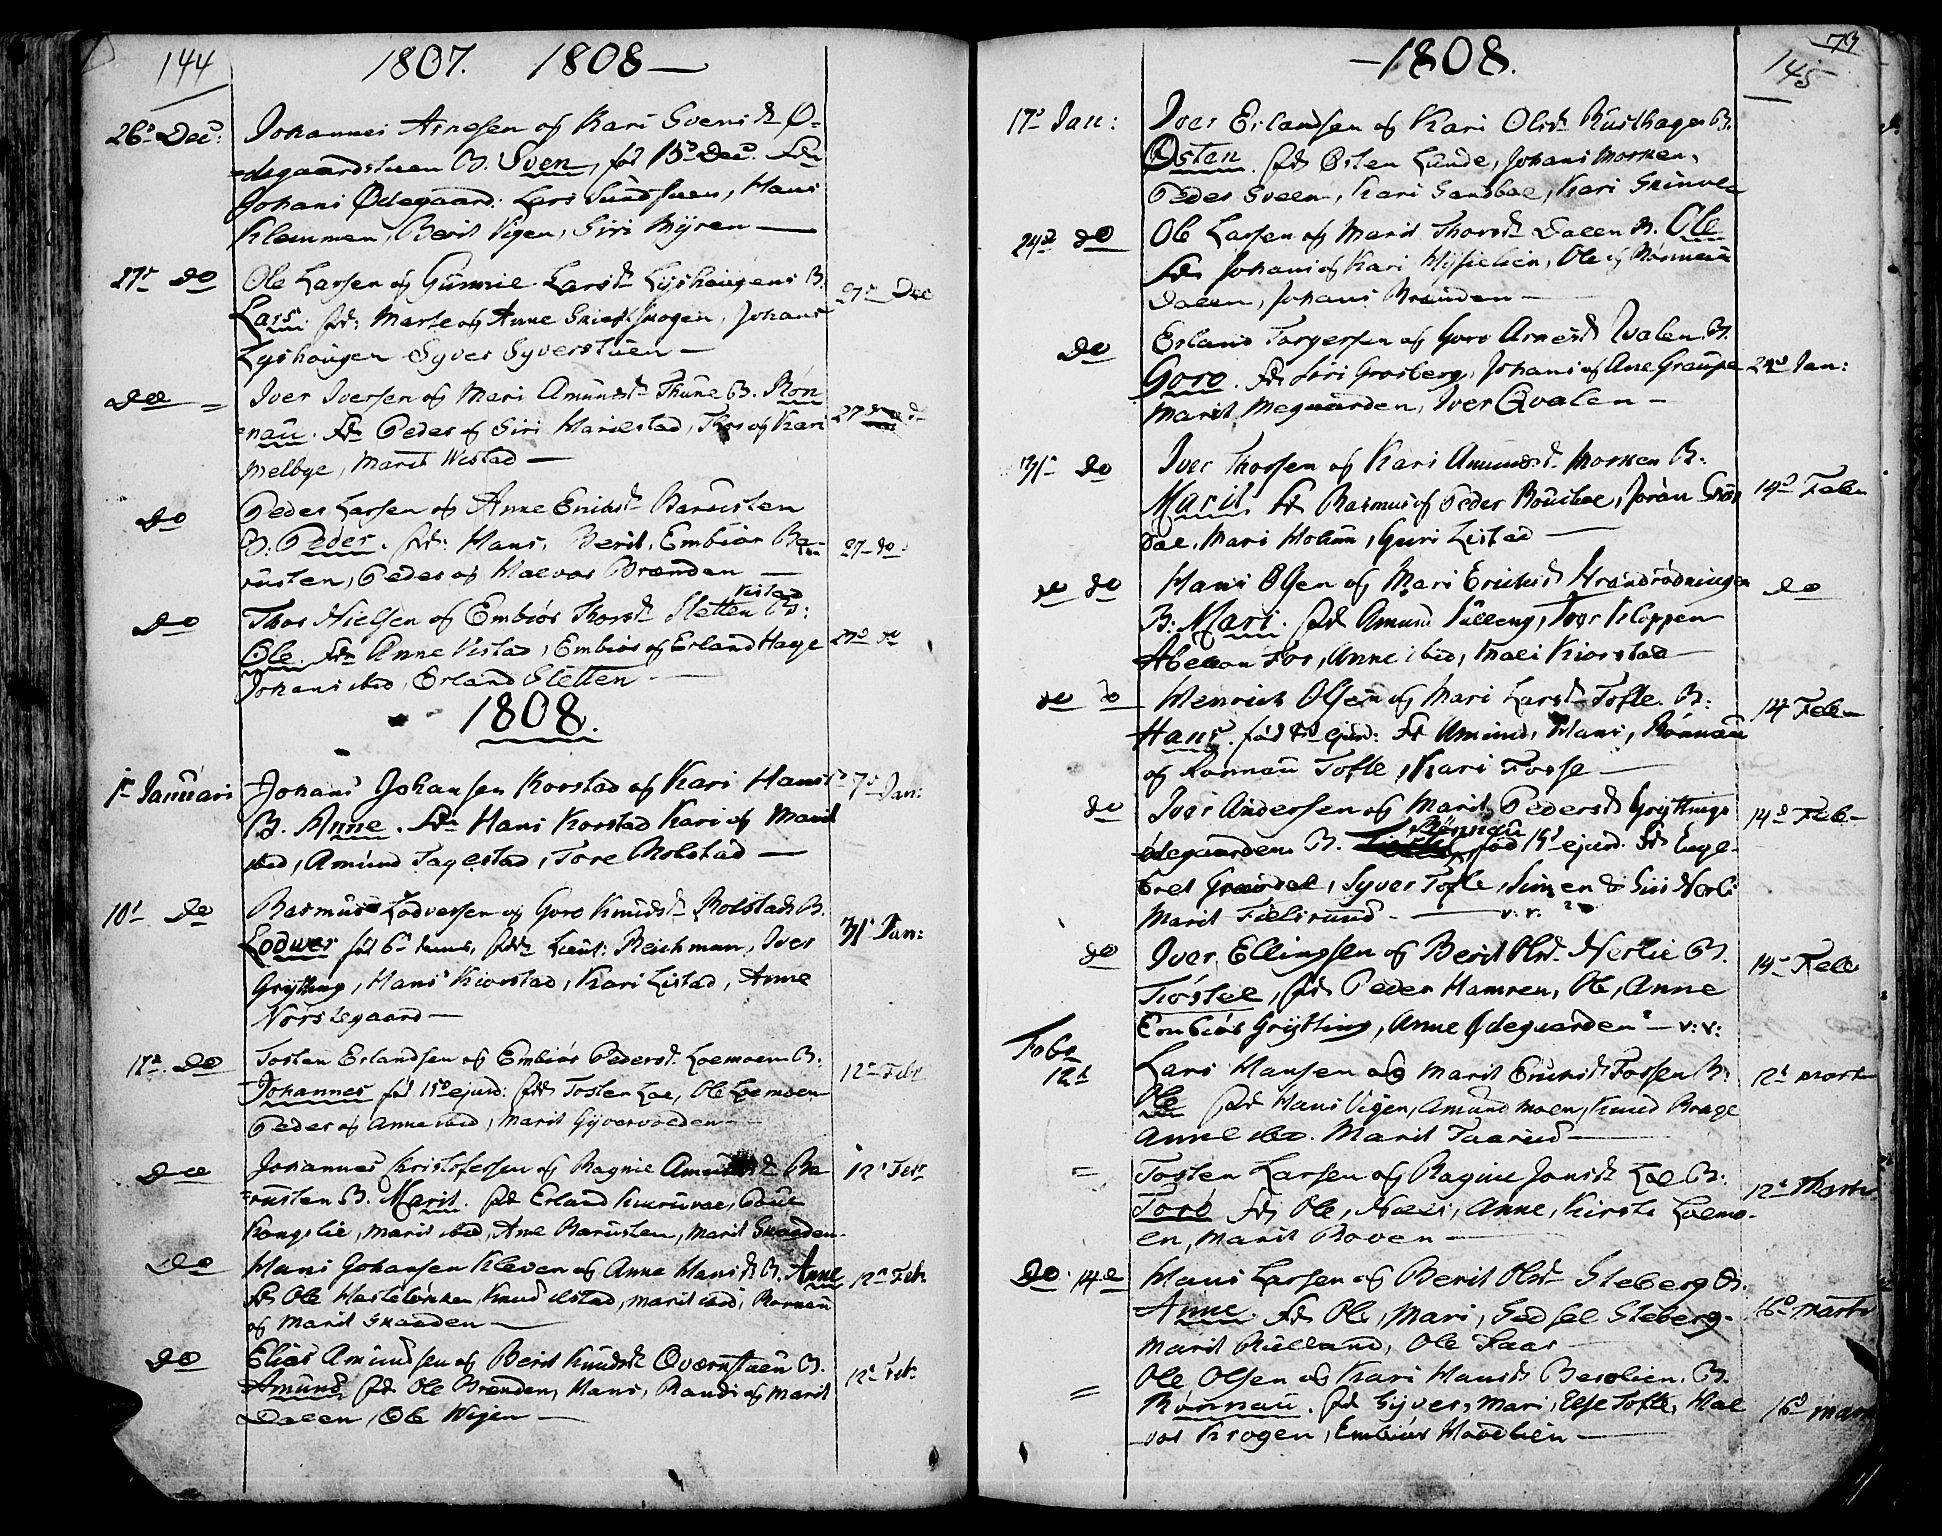 SAH, Fron prestekontor, H/Ha/Haa/L0001: Ministerialbok nr. 1, 1799-1816, s. 144-145